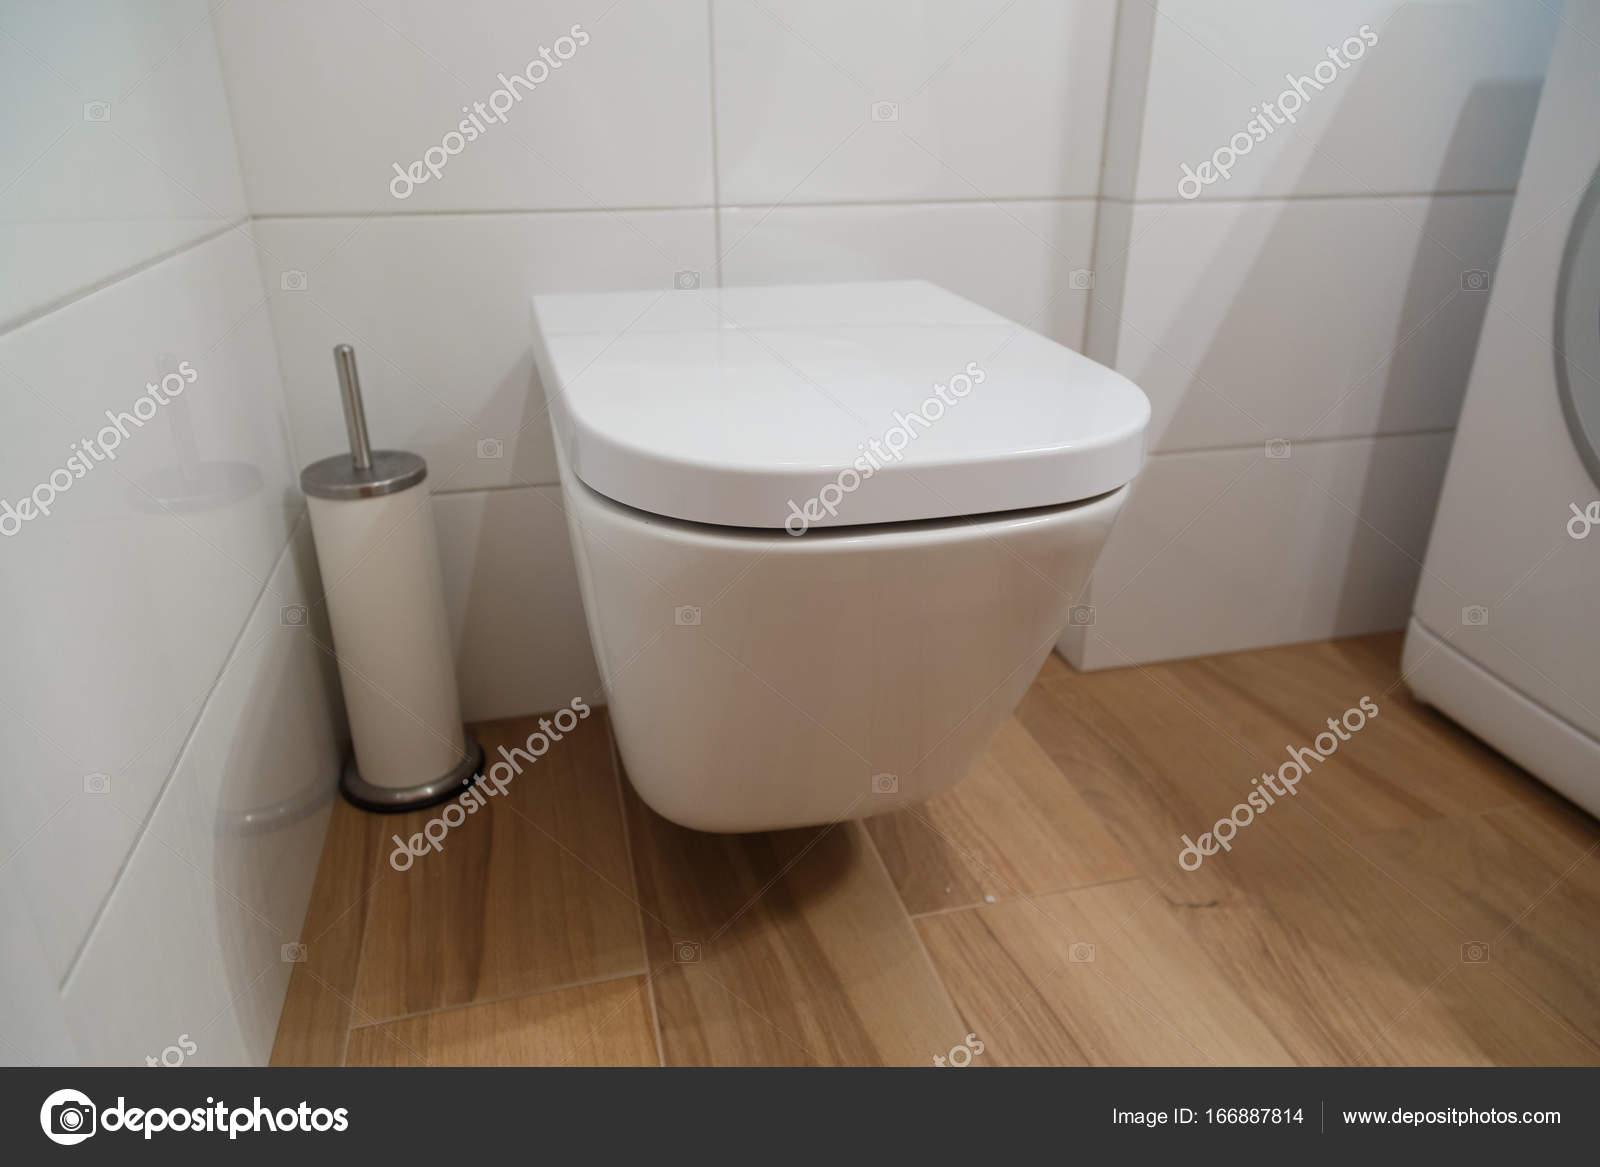 Moderne Toilette im Badezimmer Interieur — Stockfoto © vladeephoto ...